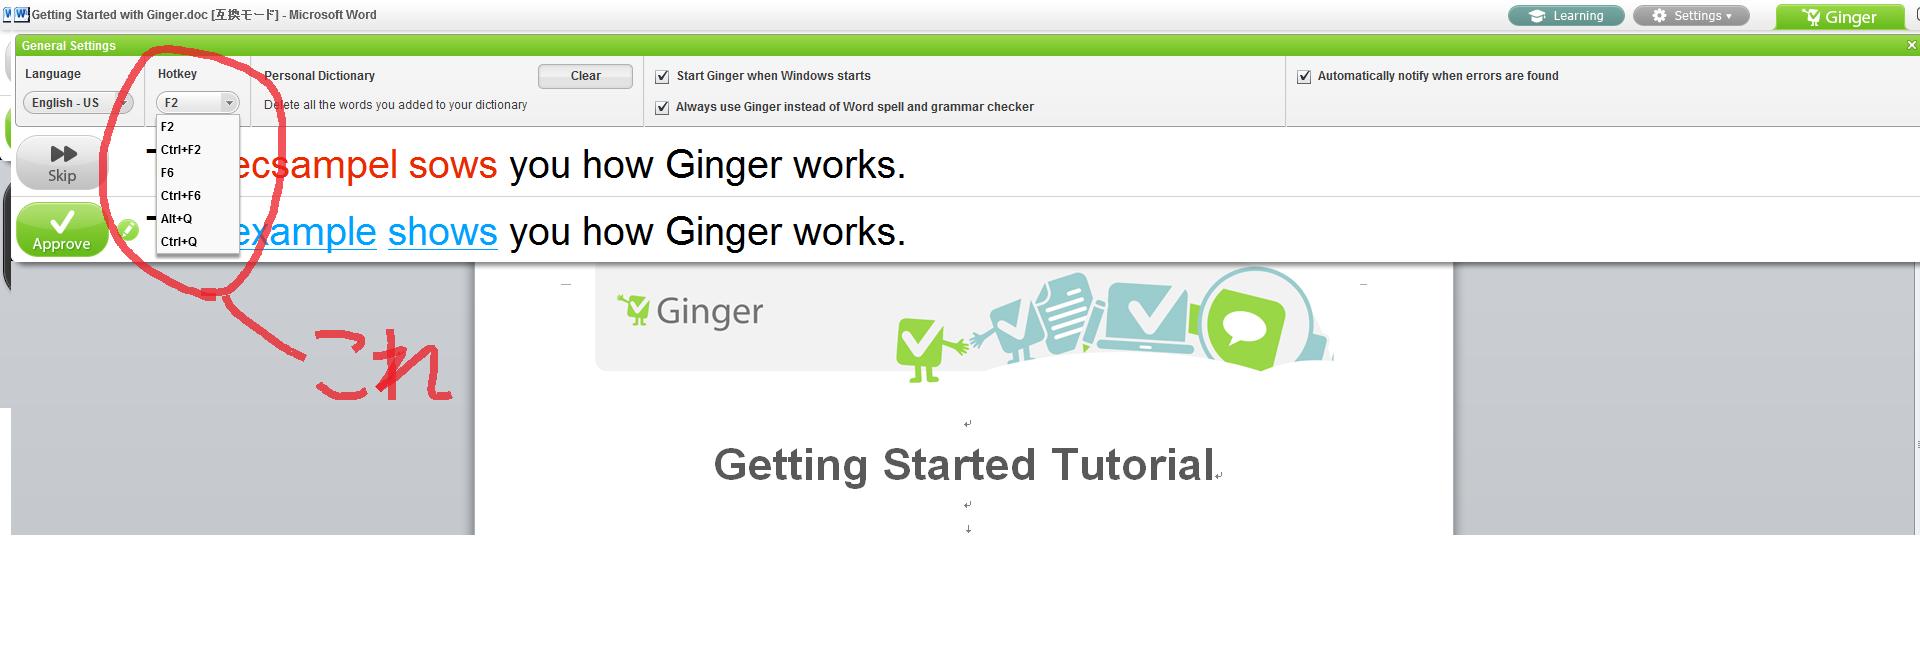 Ginger_Hotkey.png